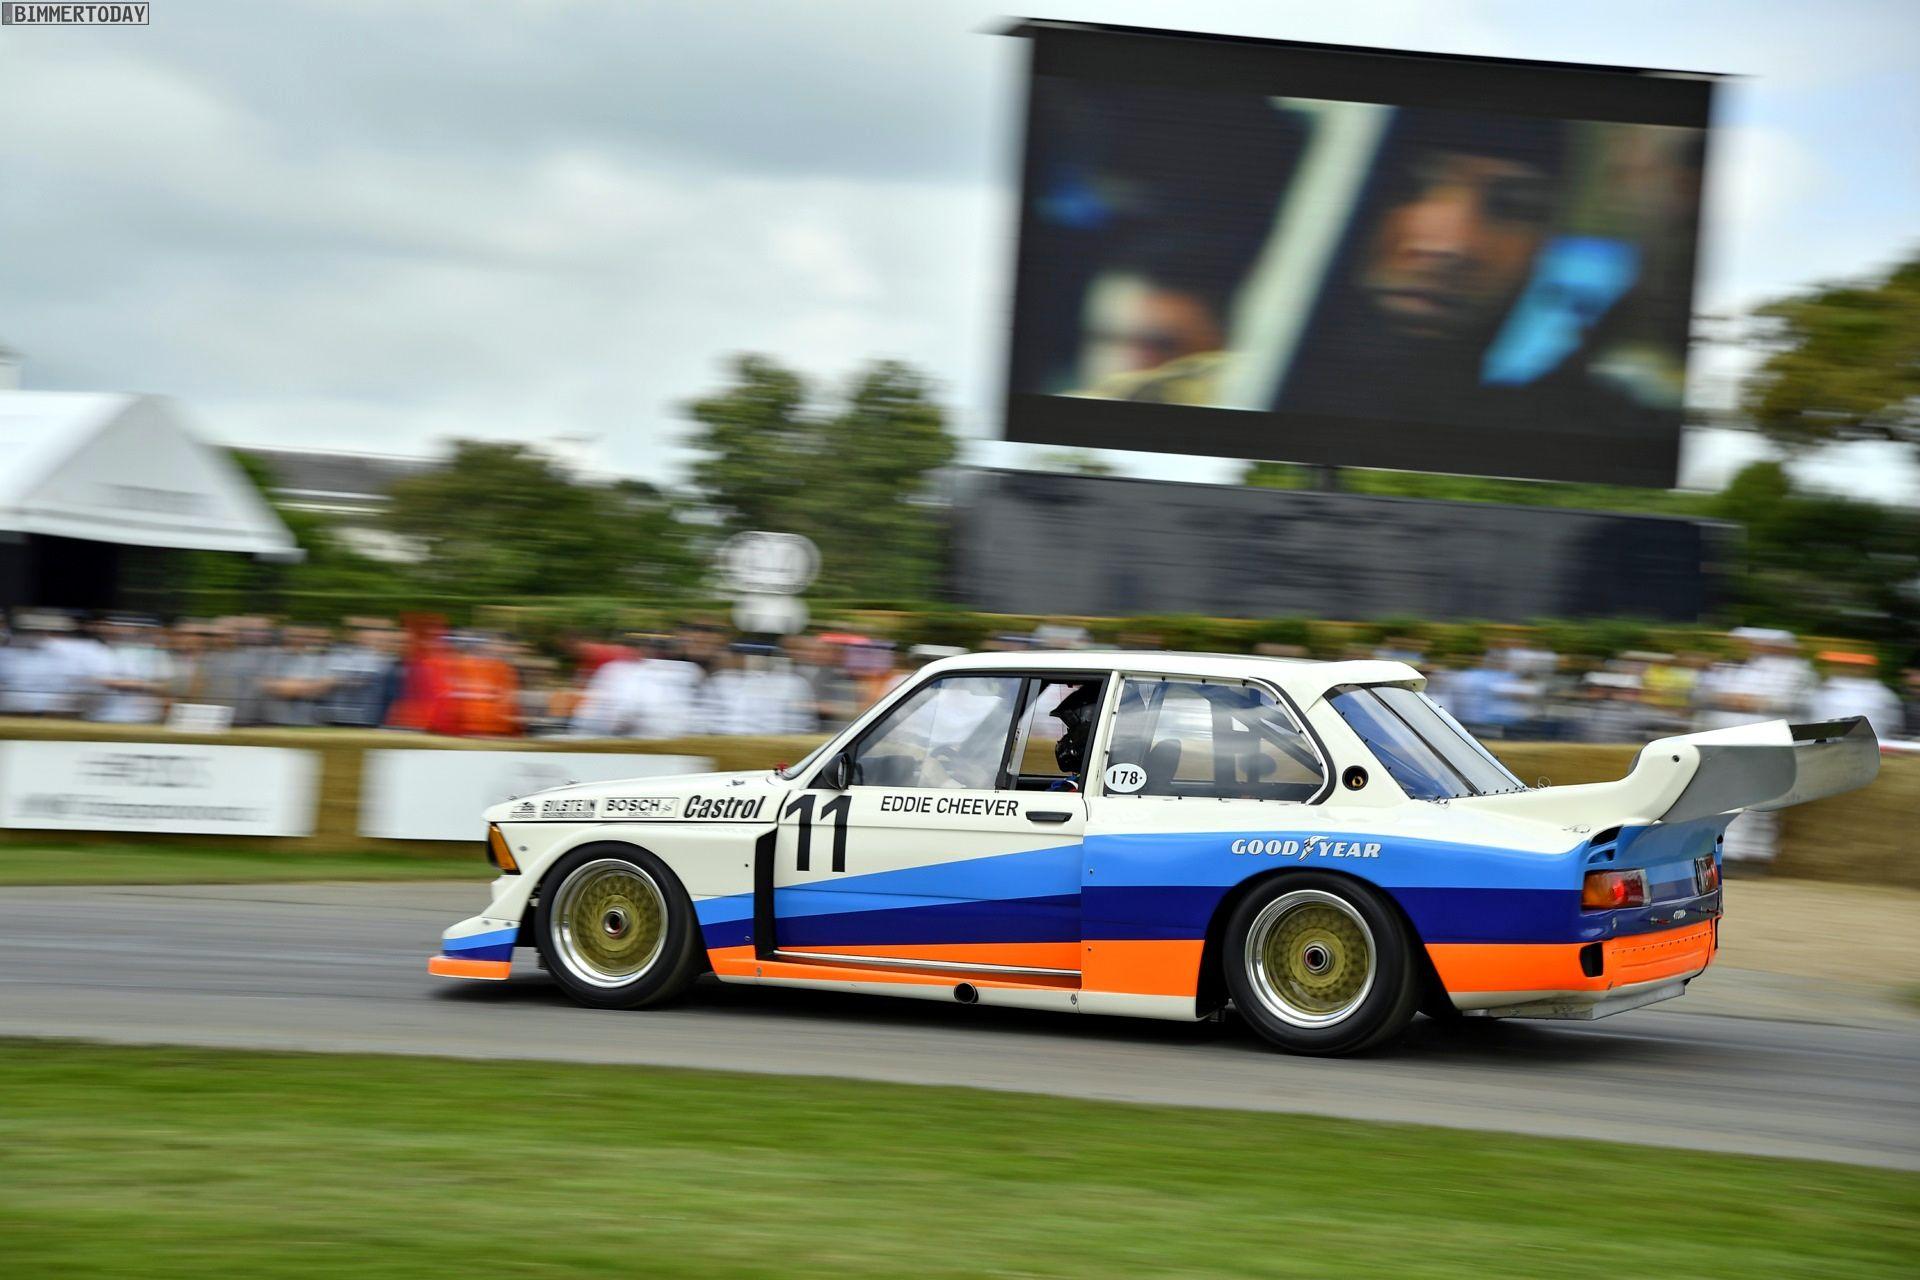 BMW (E21) 320i Turbo Race Car | /// BMW \\\\\\ | Pinterest | BMW and Cars